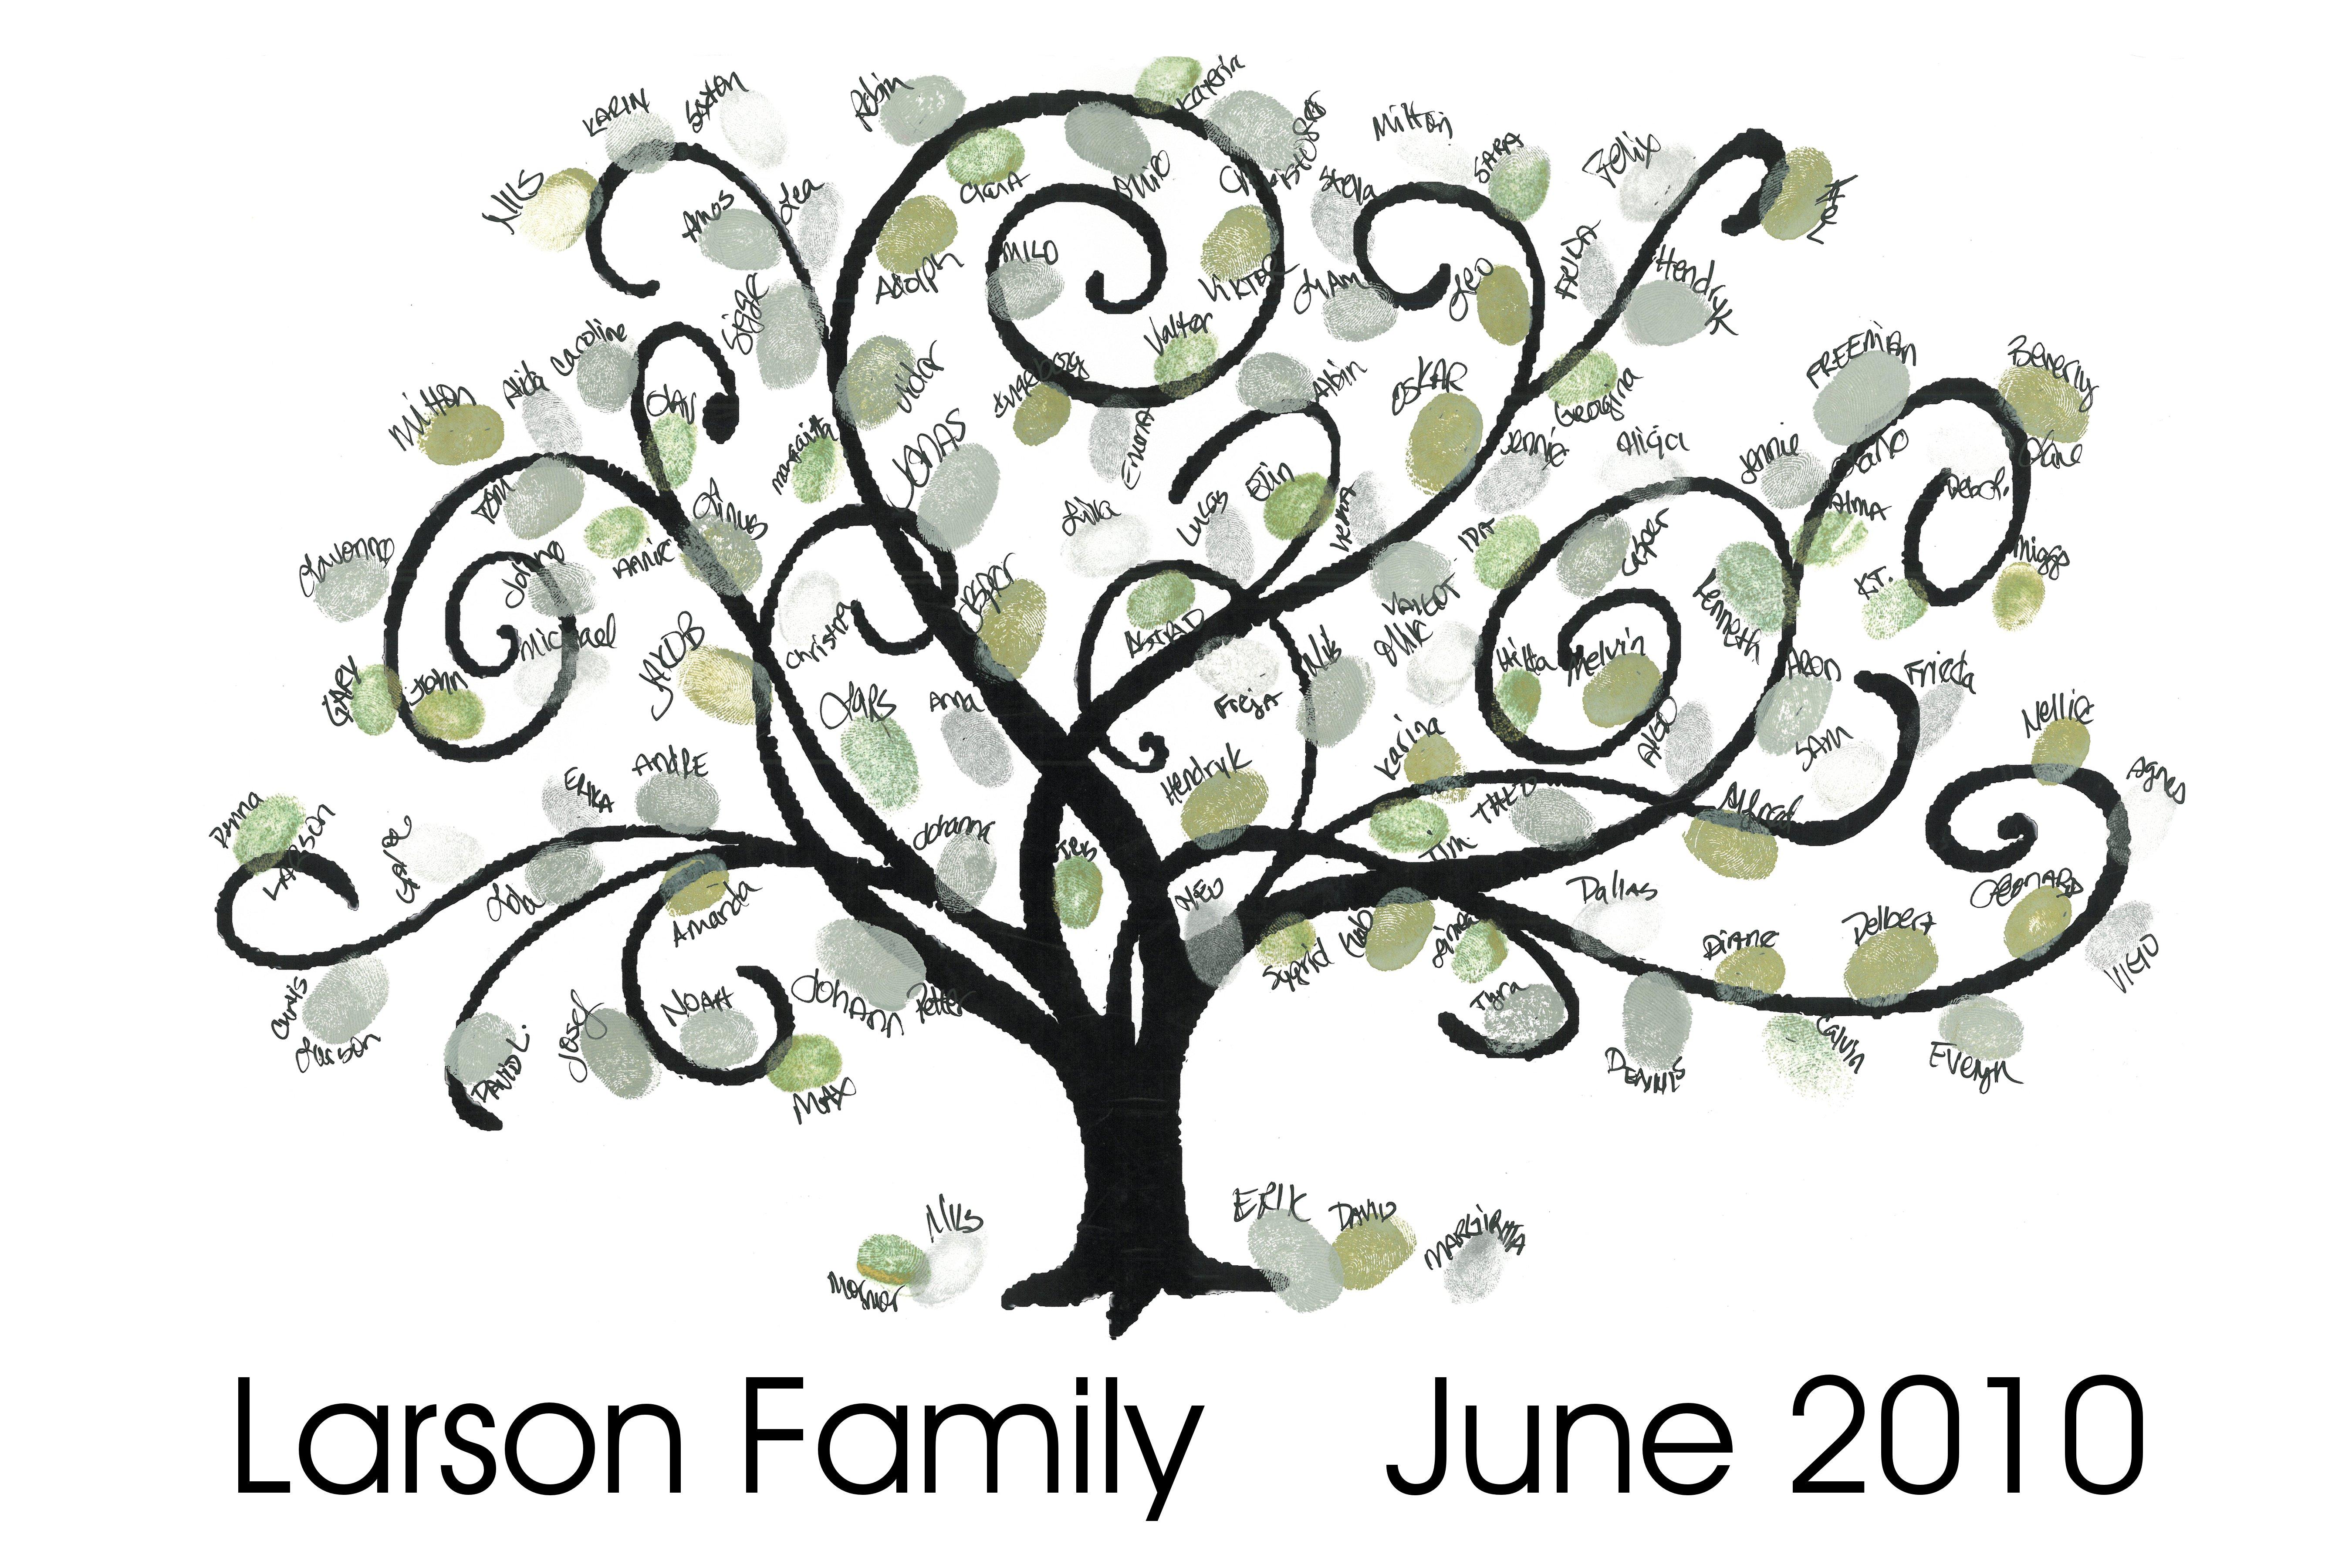 Wedding Family Tree Template 8614018 Hitori49fo